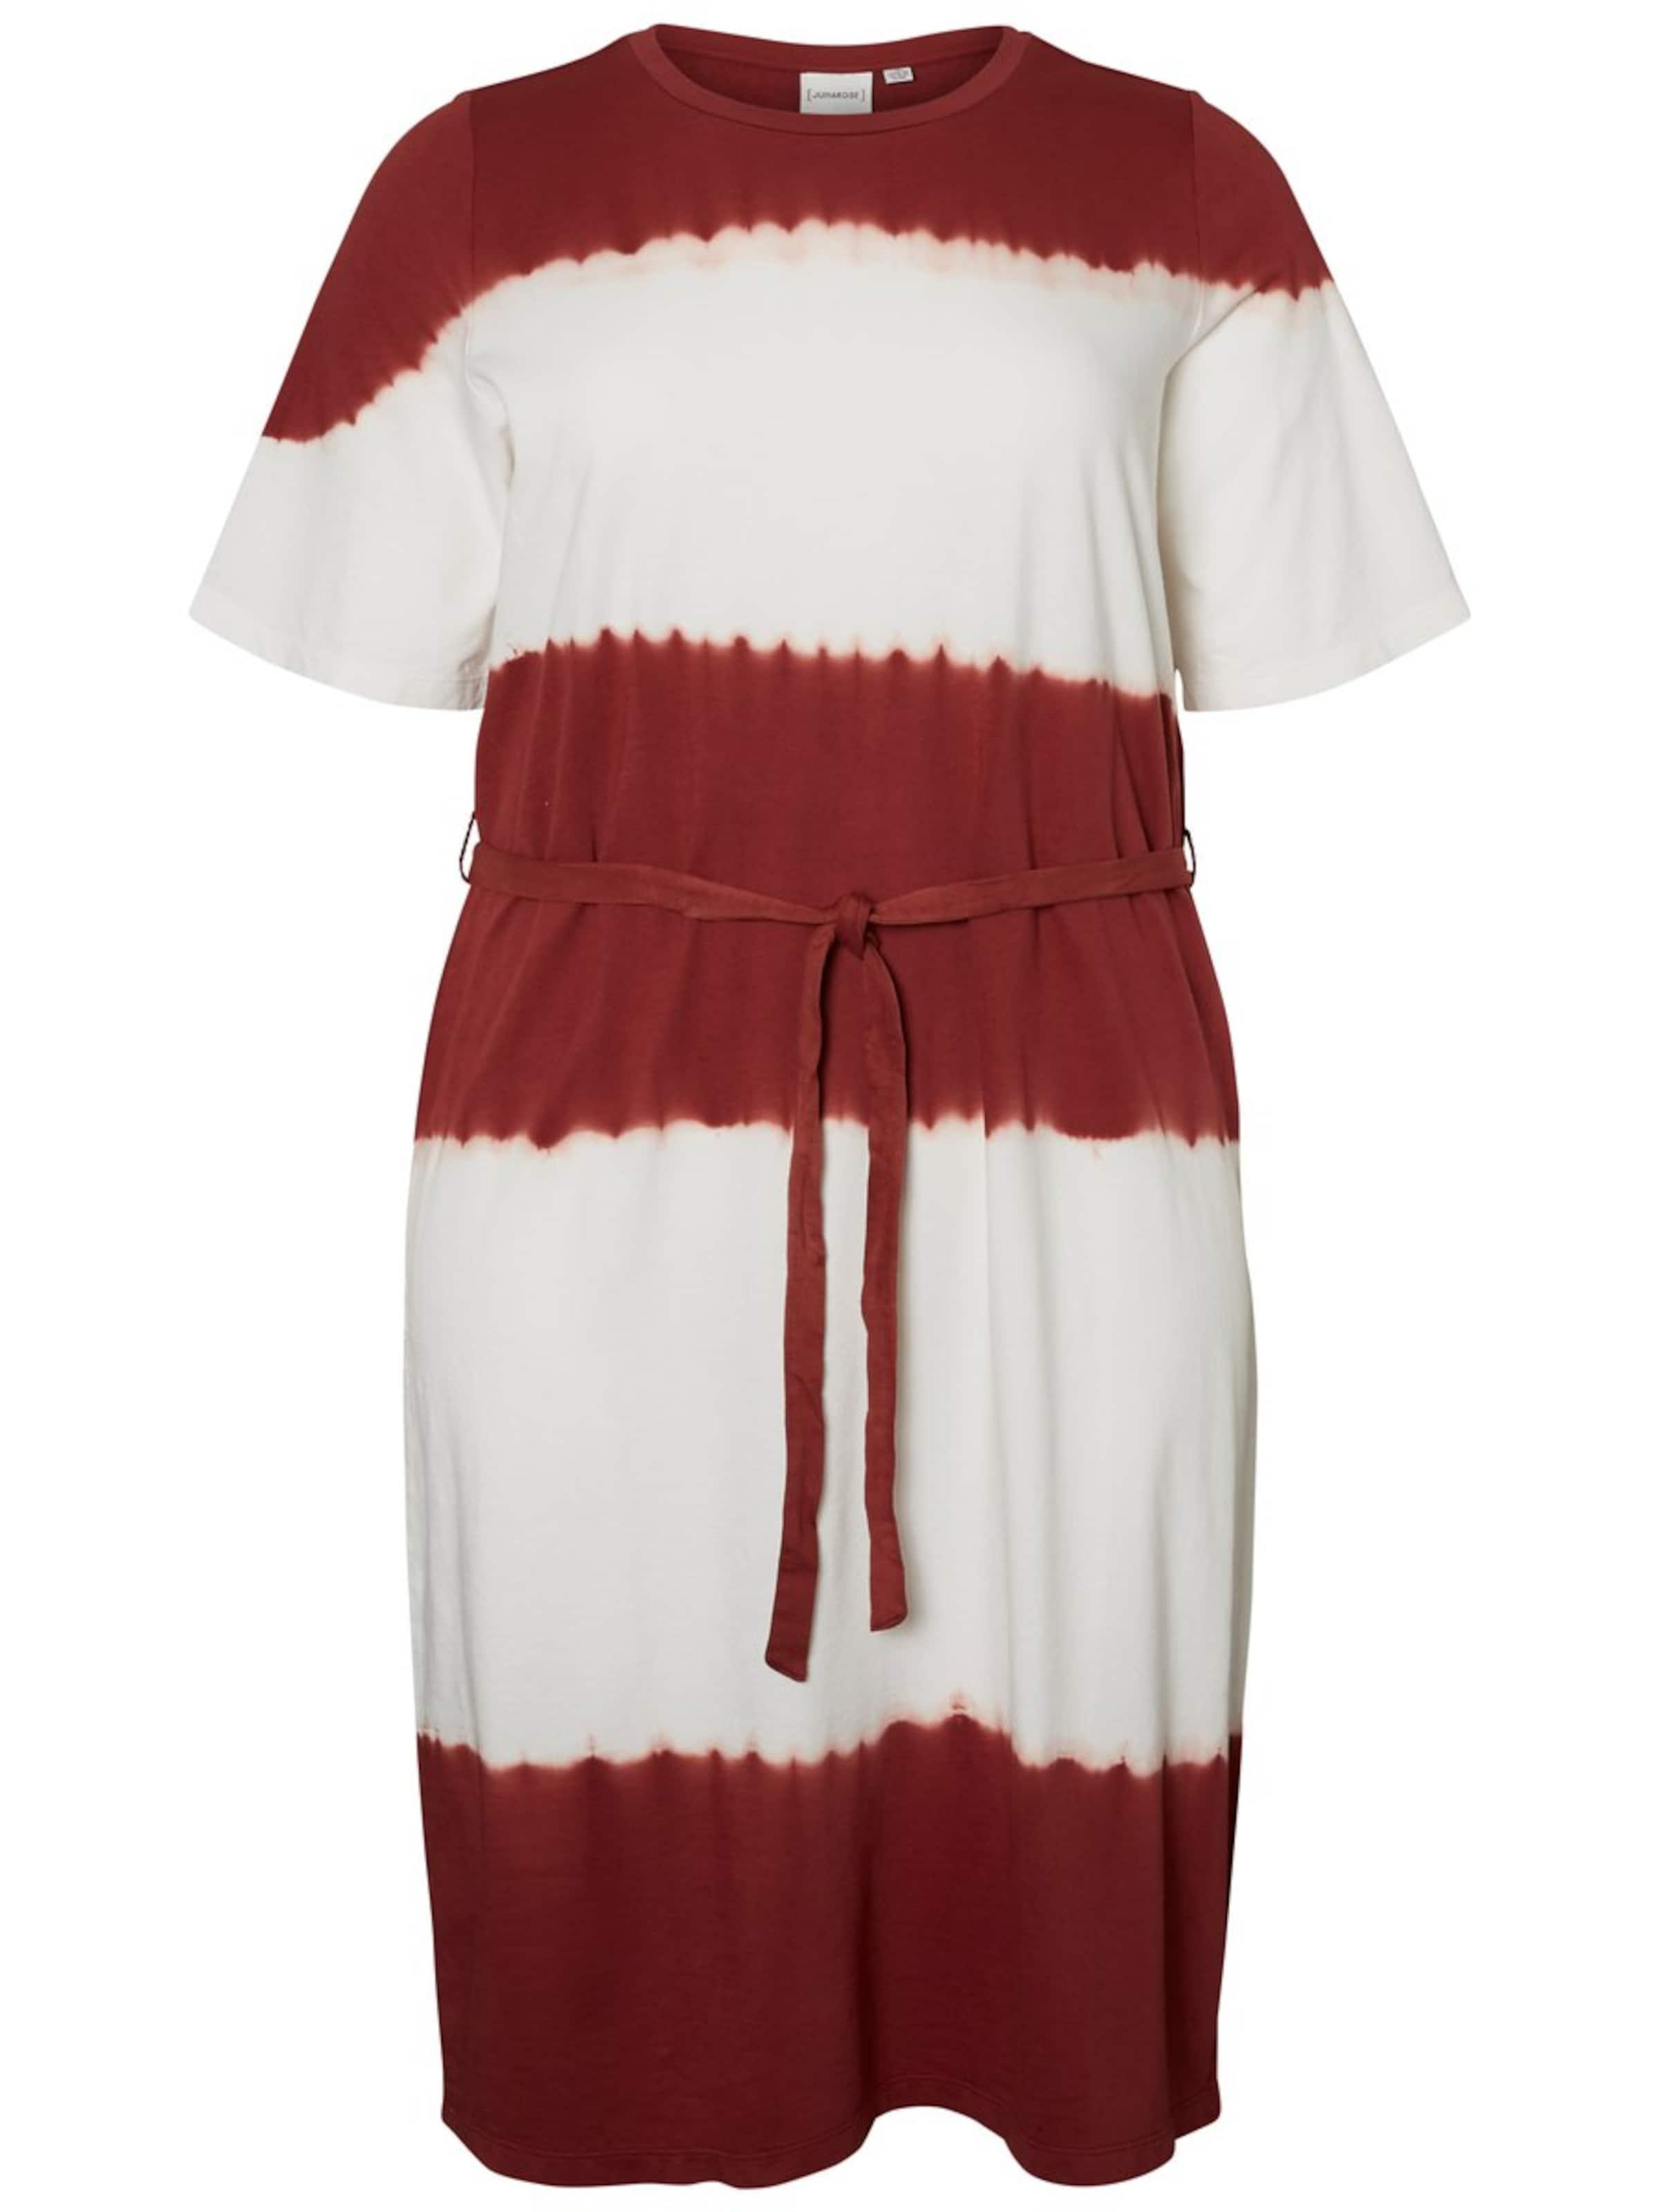 RostbraunWeiß Junarose Kleid In Junarose Kleid sCBrhdQotx